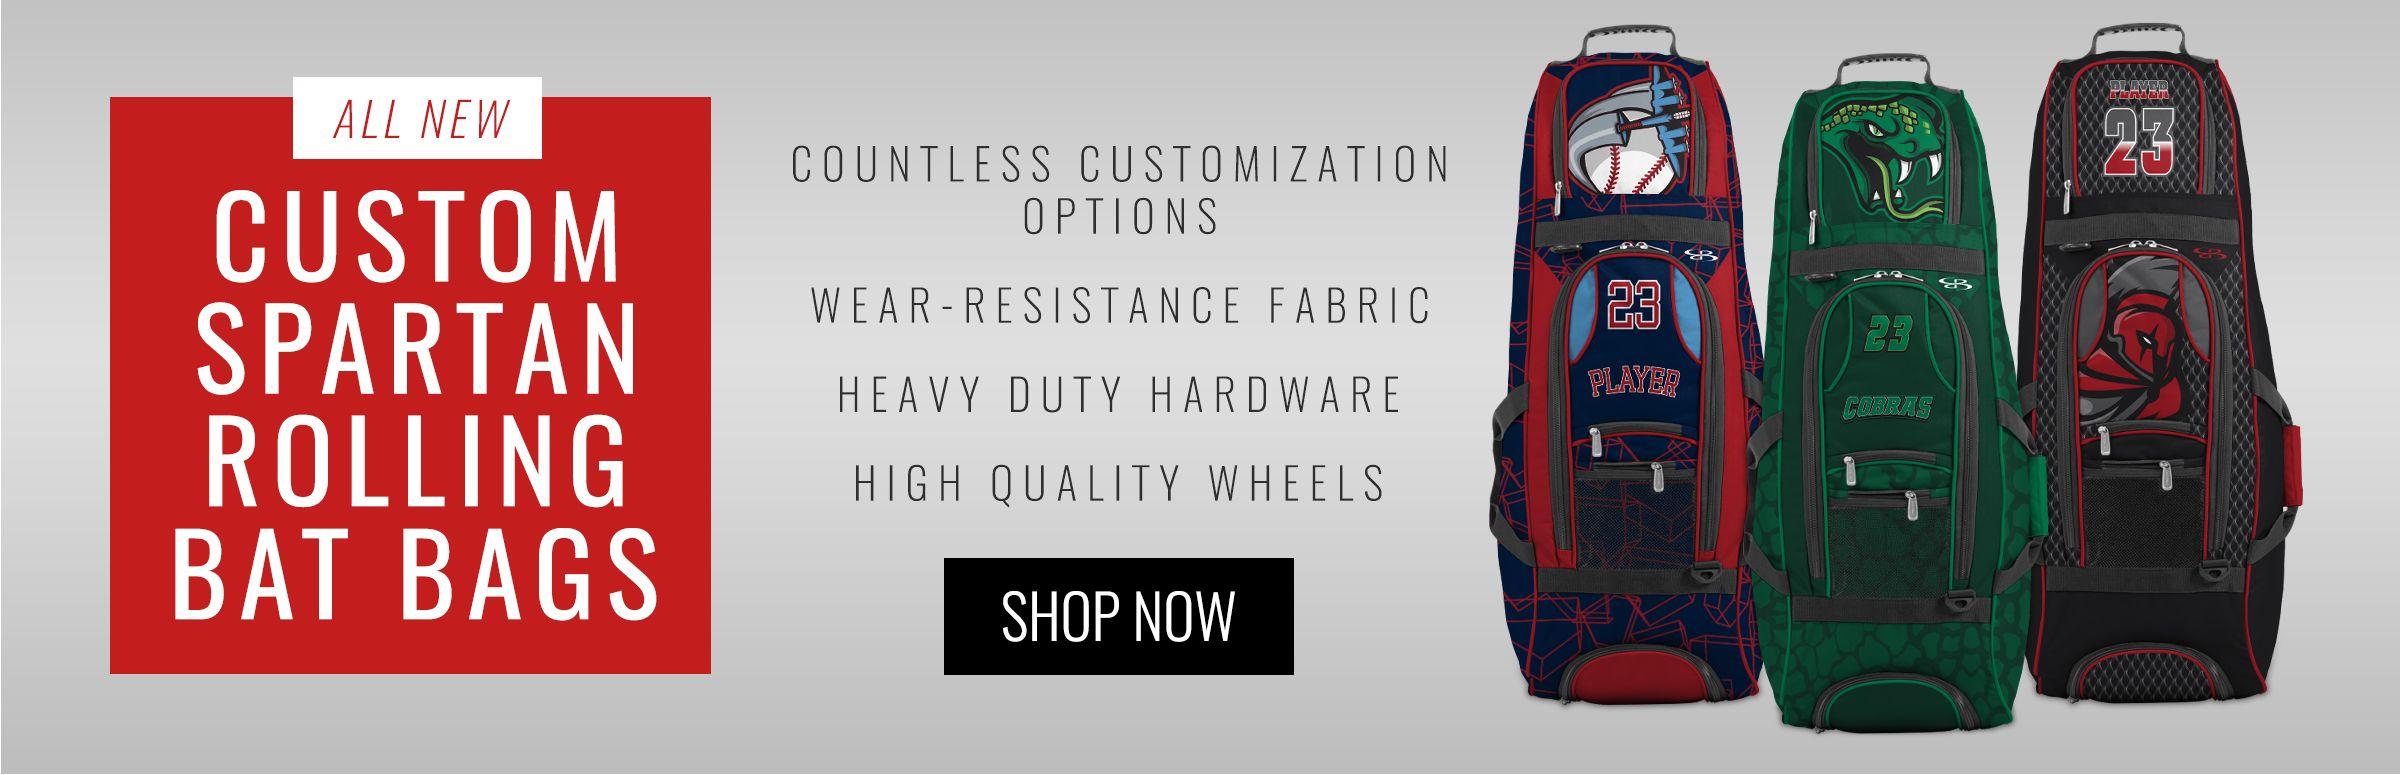 Custom Spartan Rolling Bat Bags